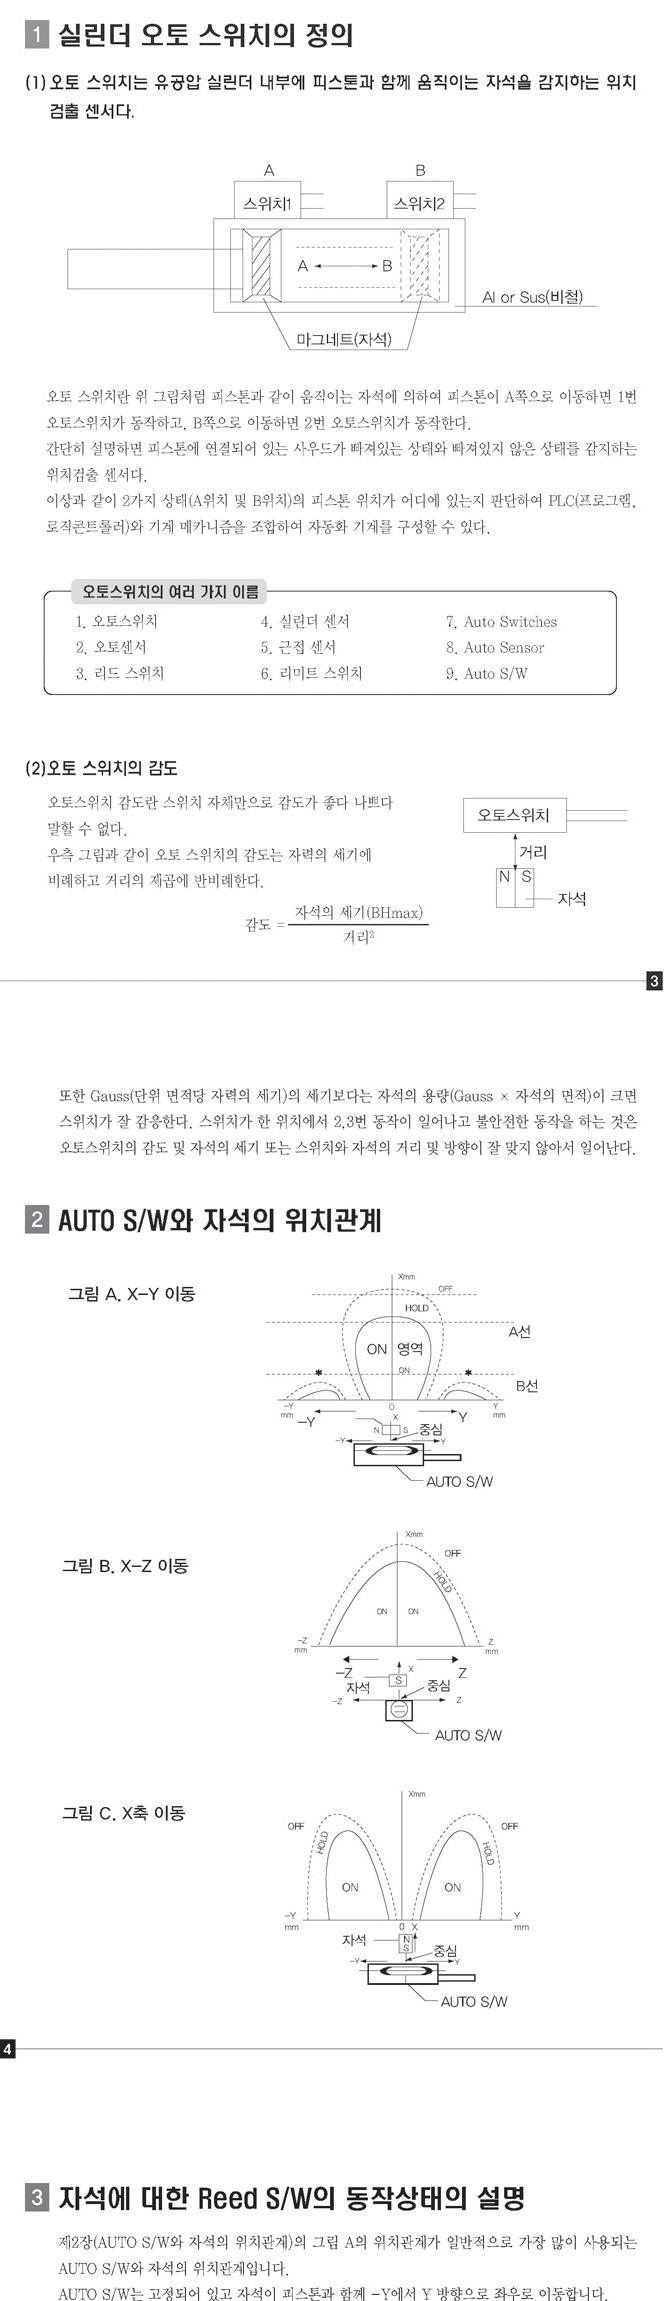 Saewon Electronics Auto Switches Terminology